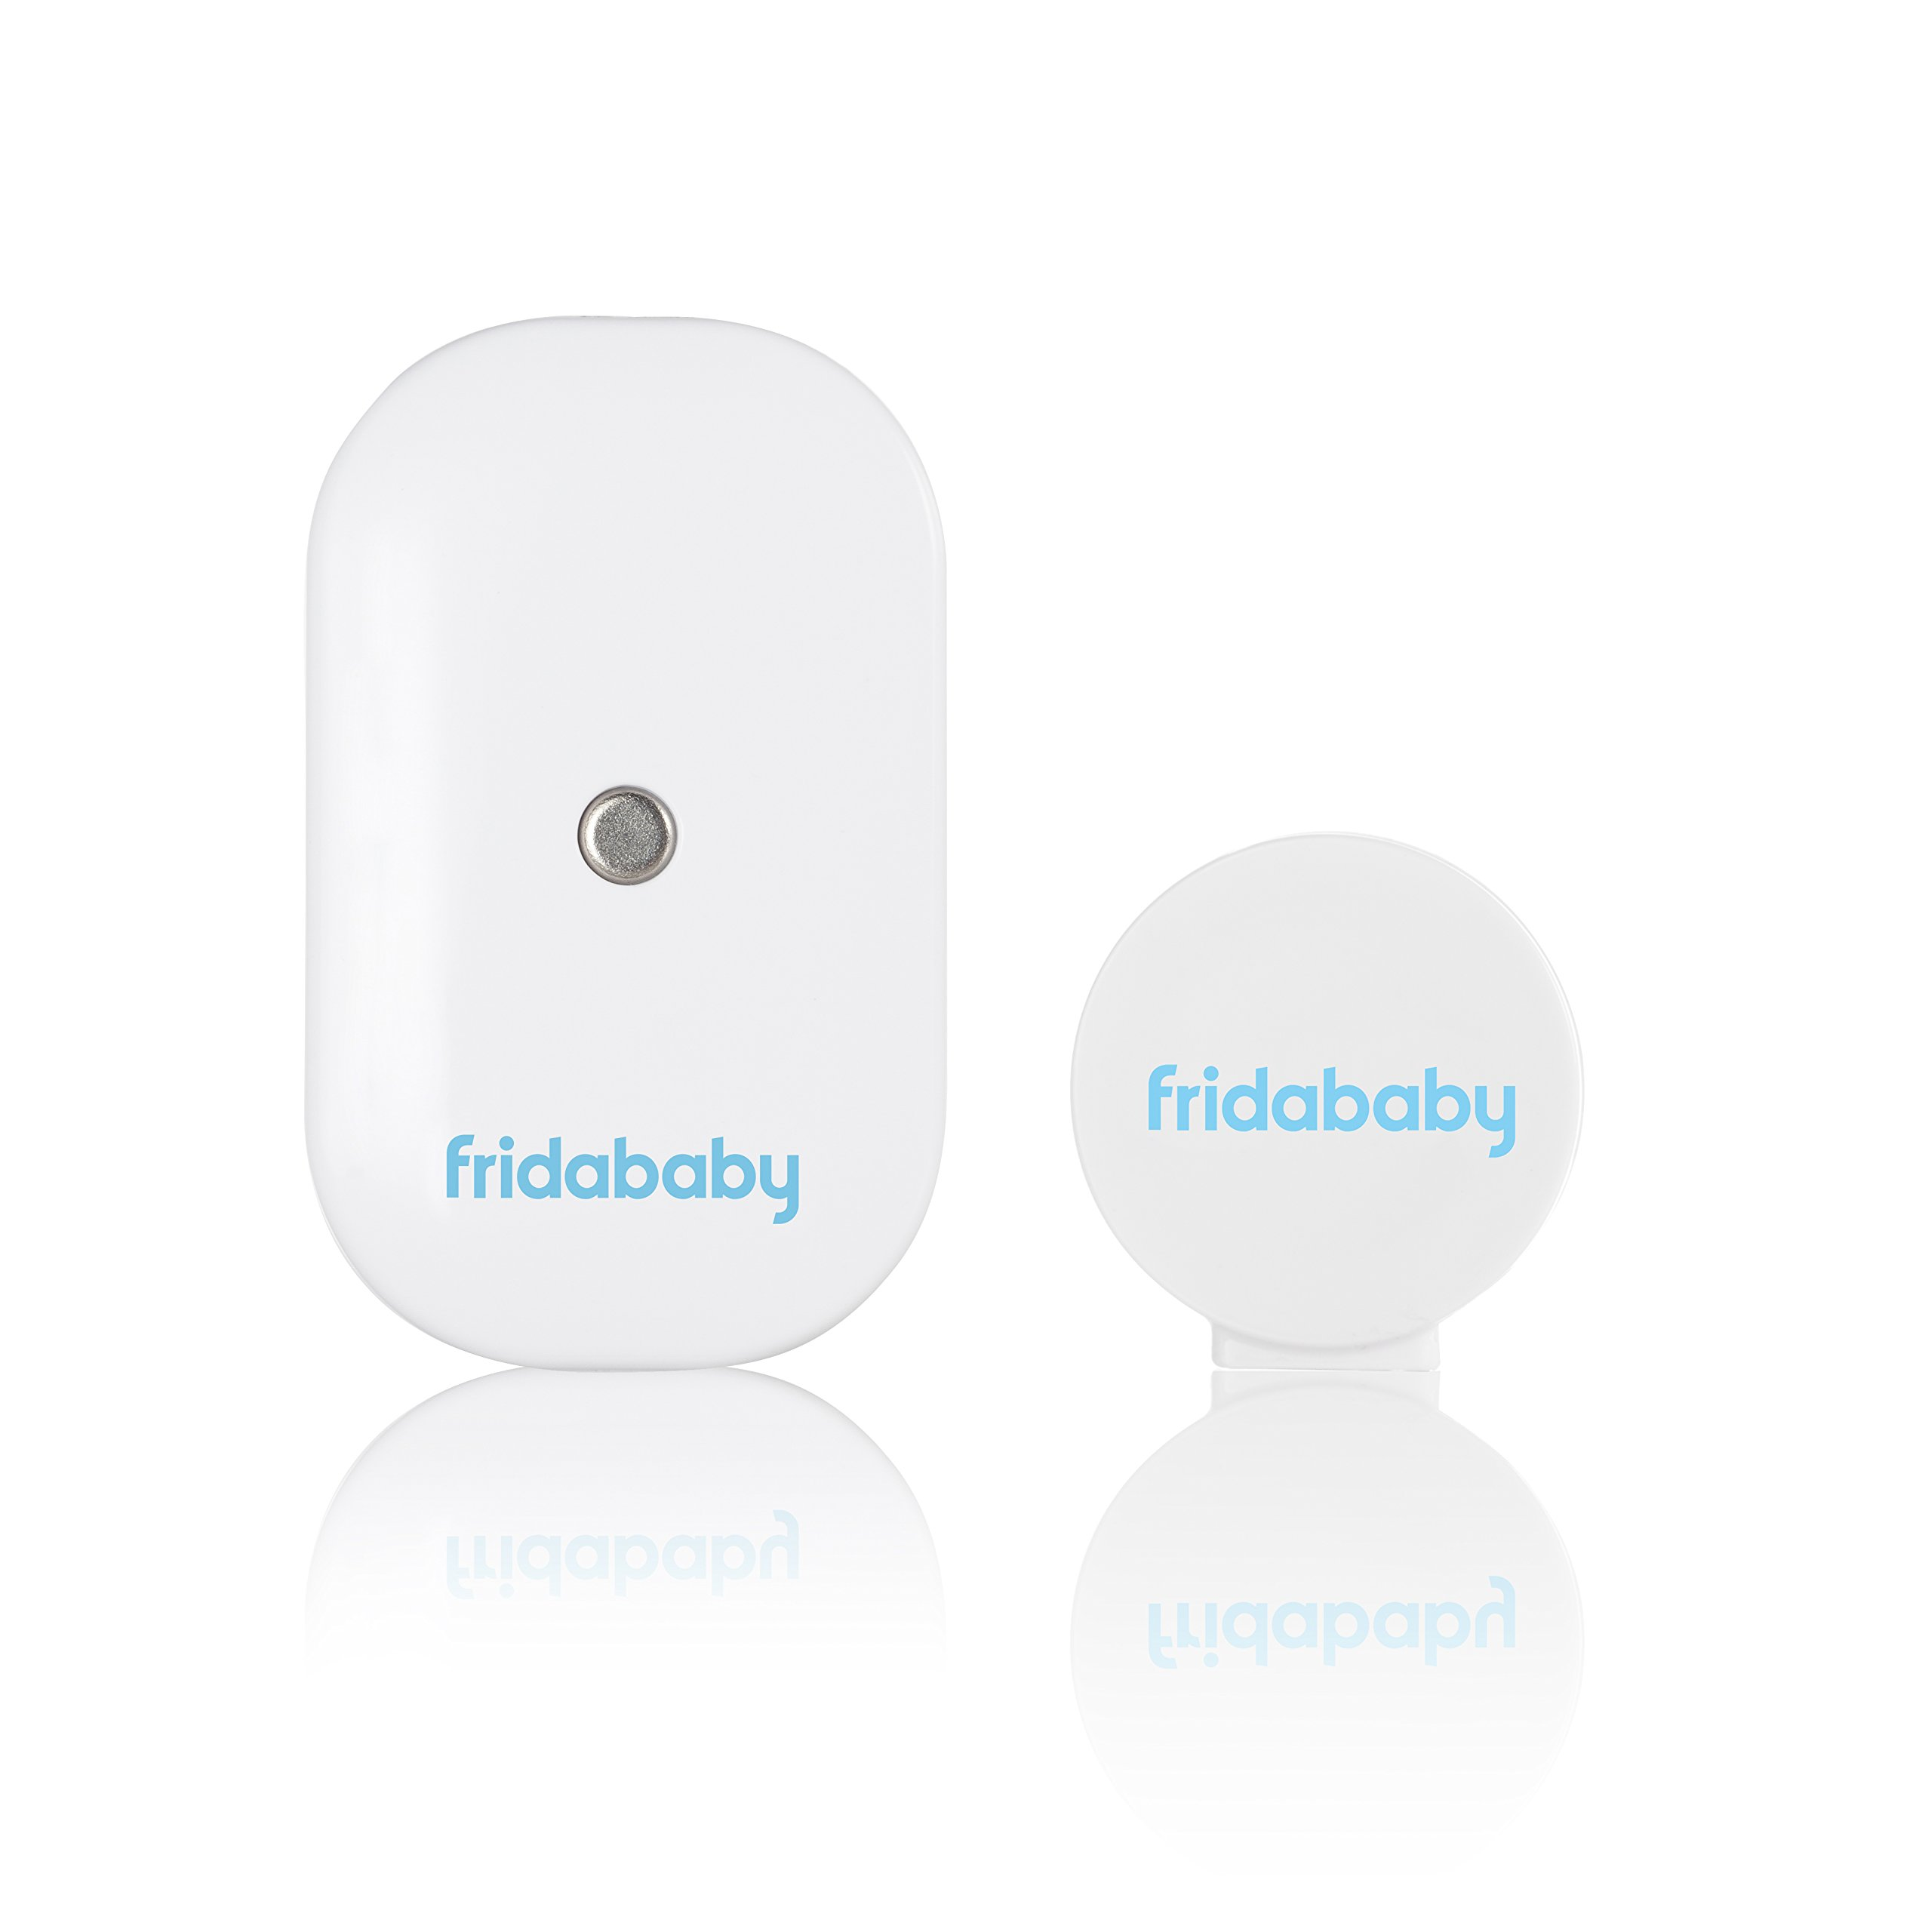 Fridababy FeverFrida The Thermonitor Plus 1 Pack of 10 Adhesive